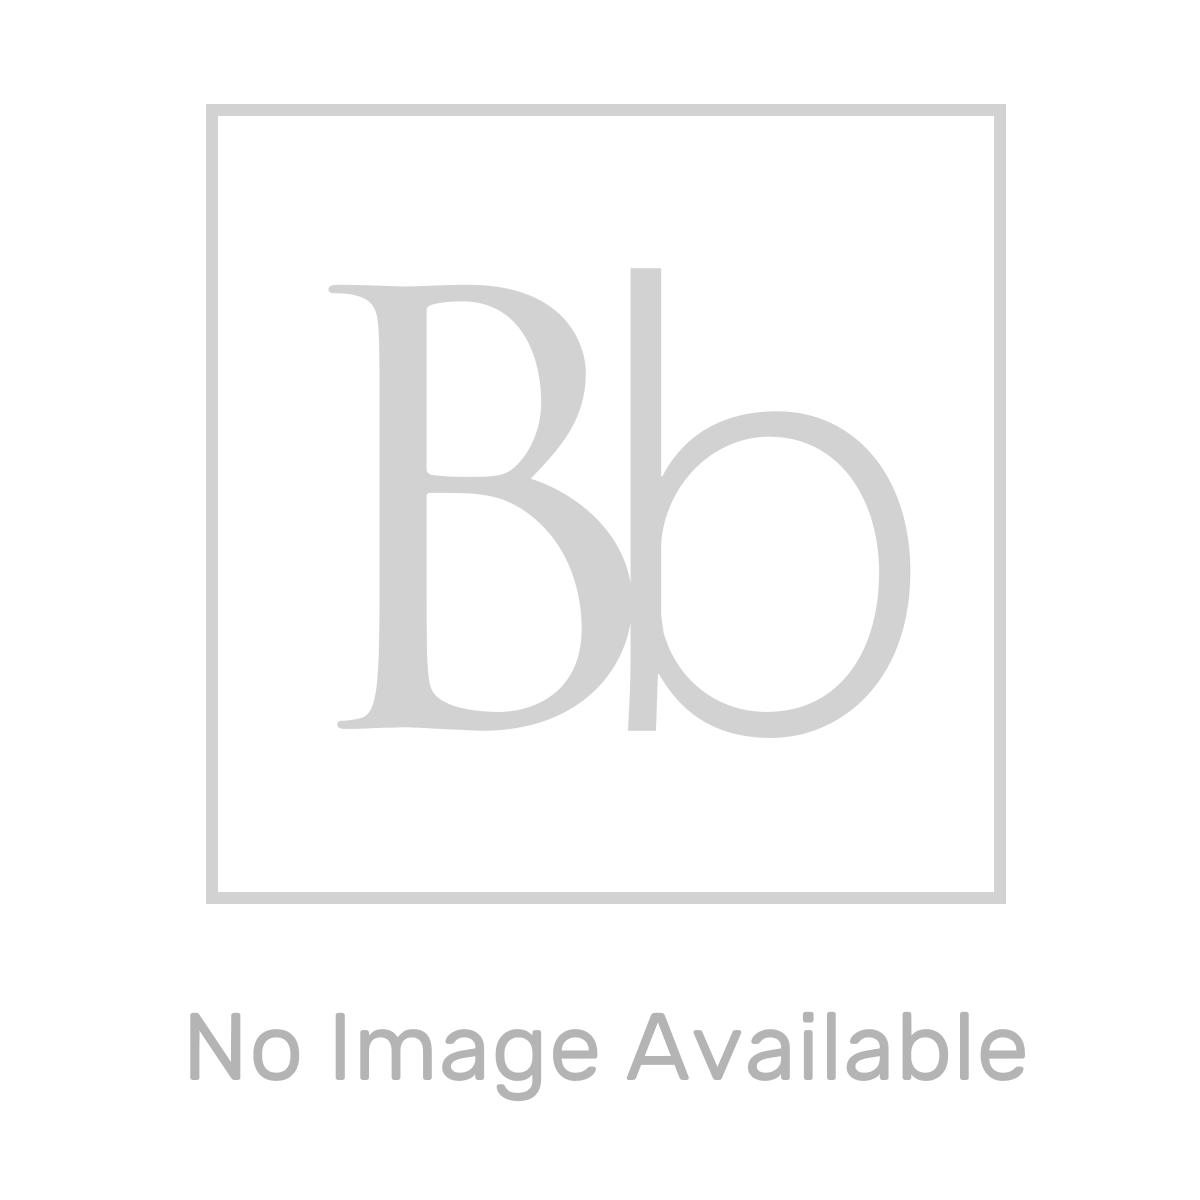 Aquadart White Slate Shower Tray 1700 x 760 Overhead